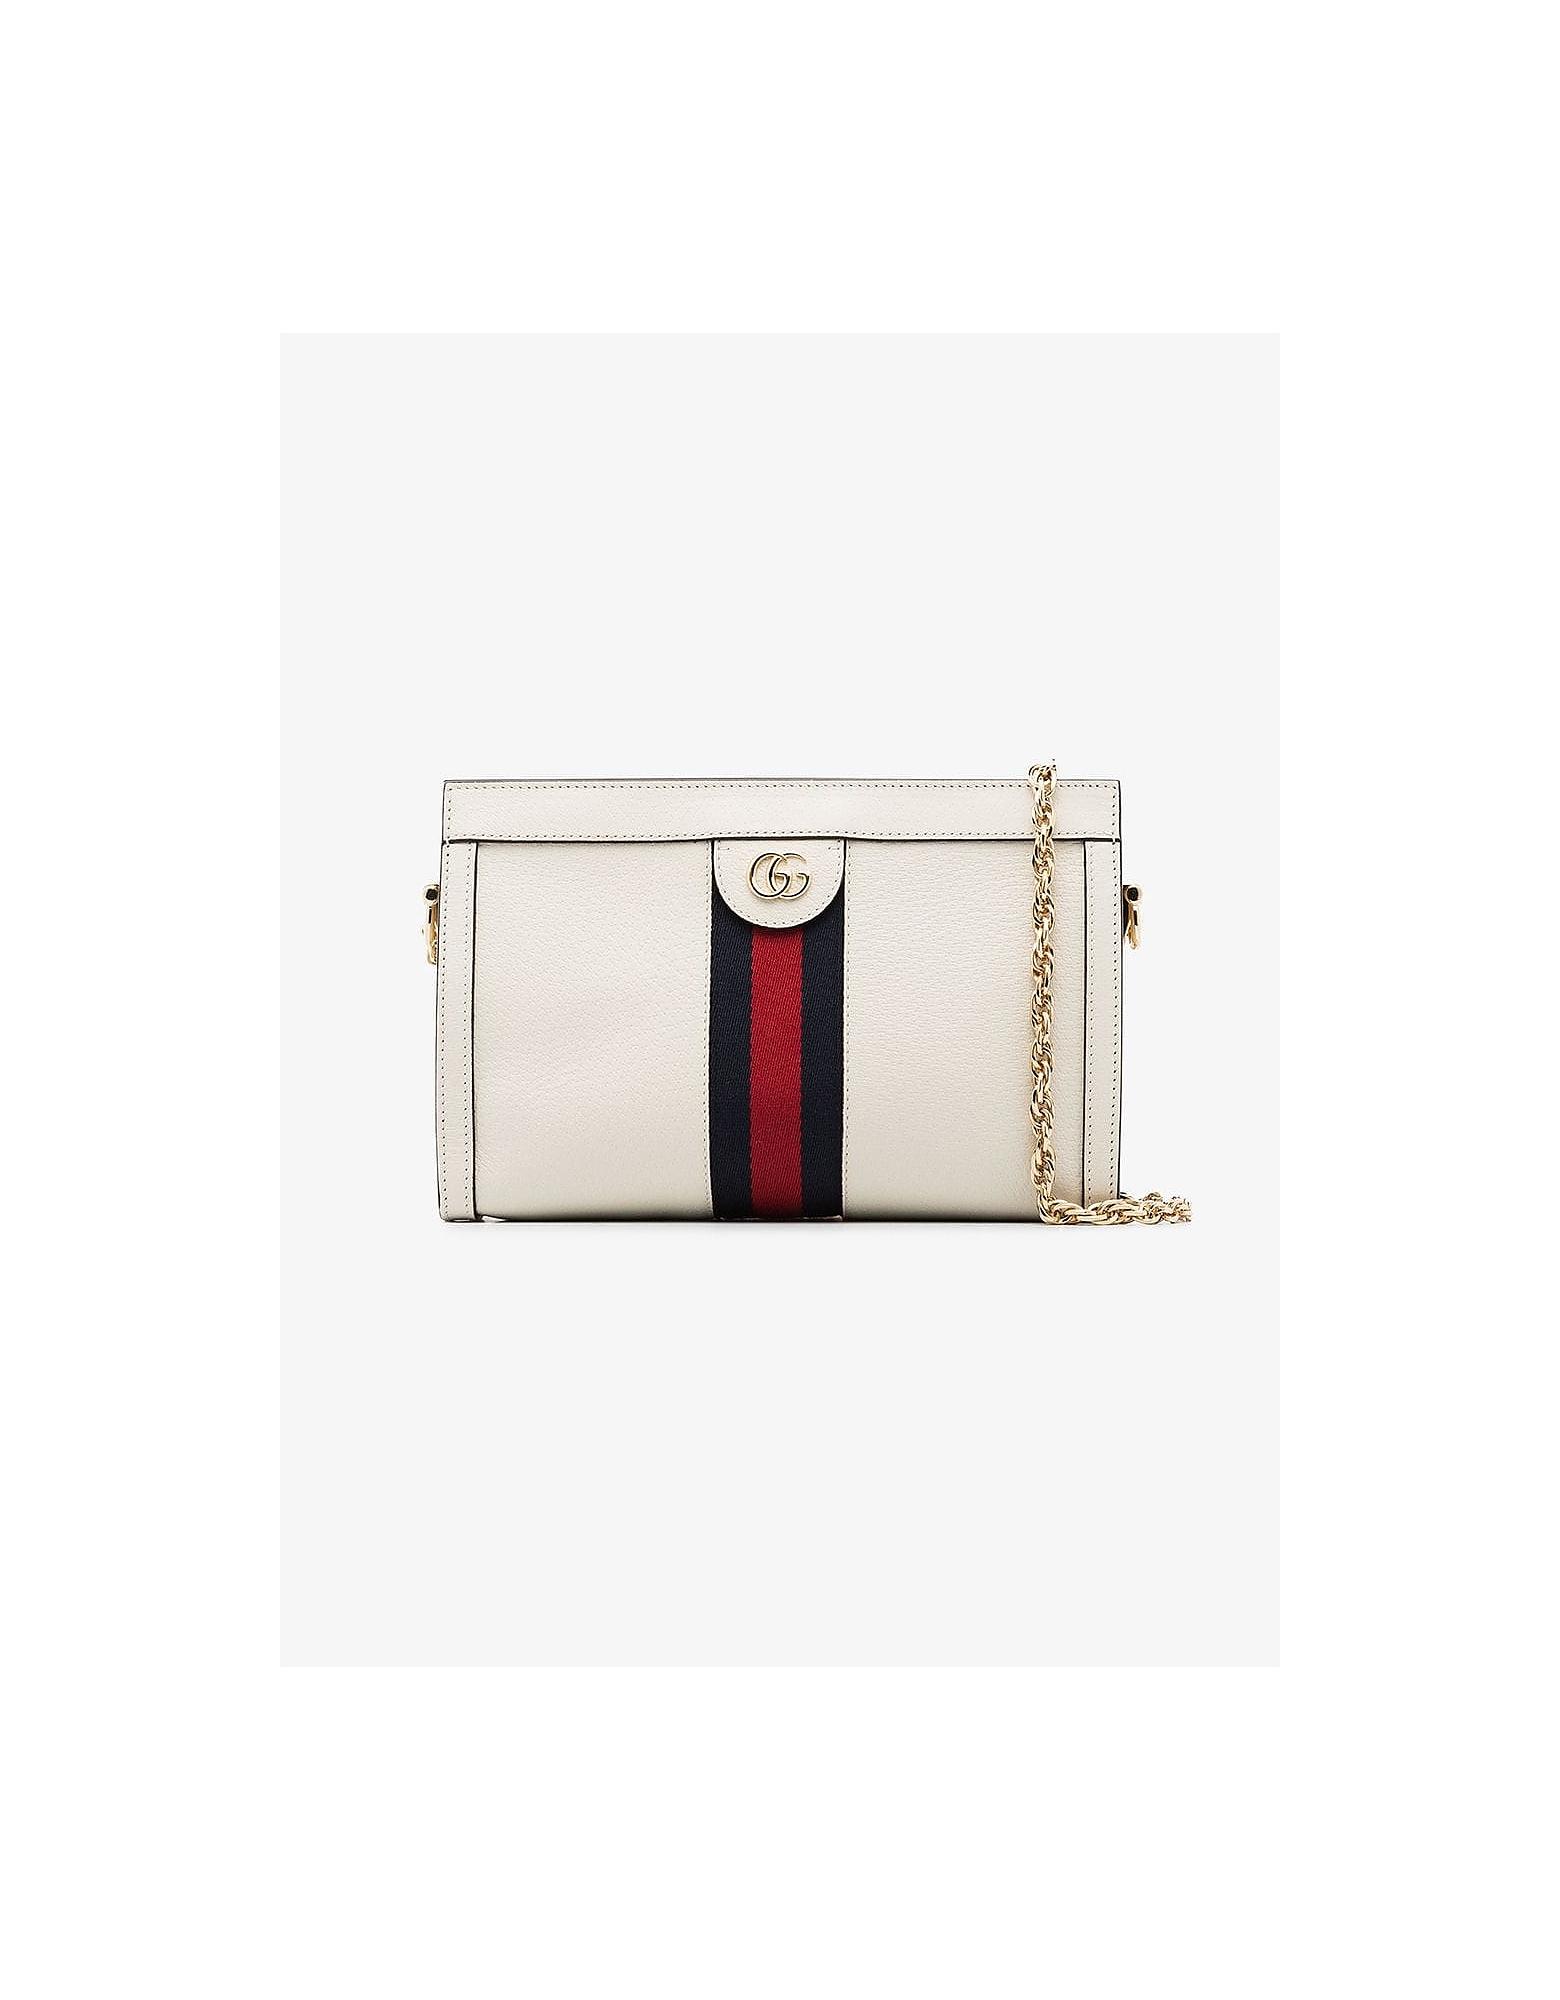 Gucci Designer Handbags, Small Ophidia shoulder bag